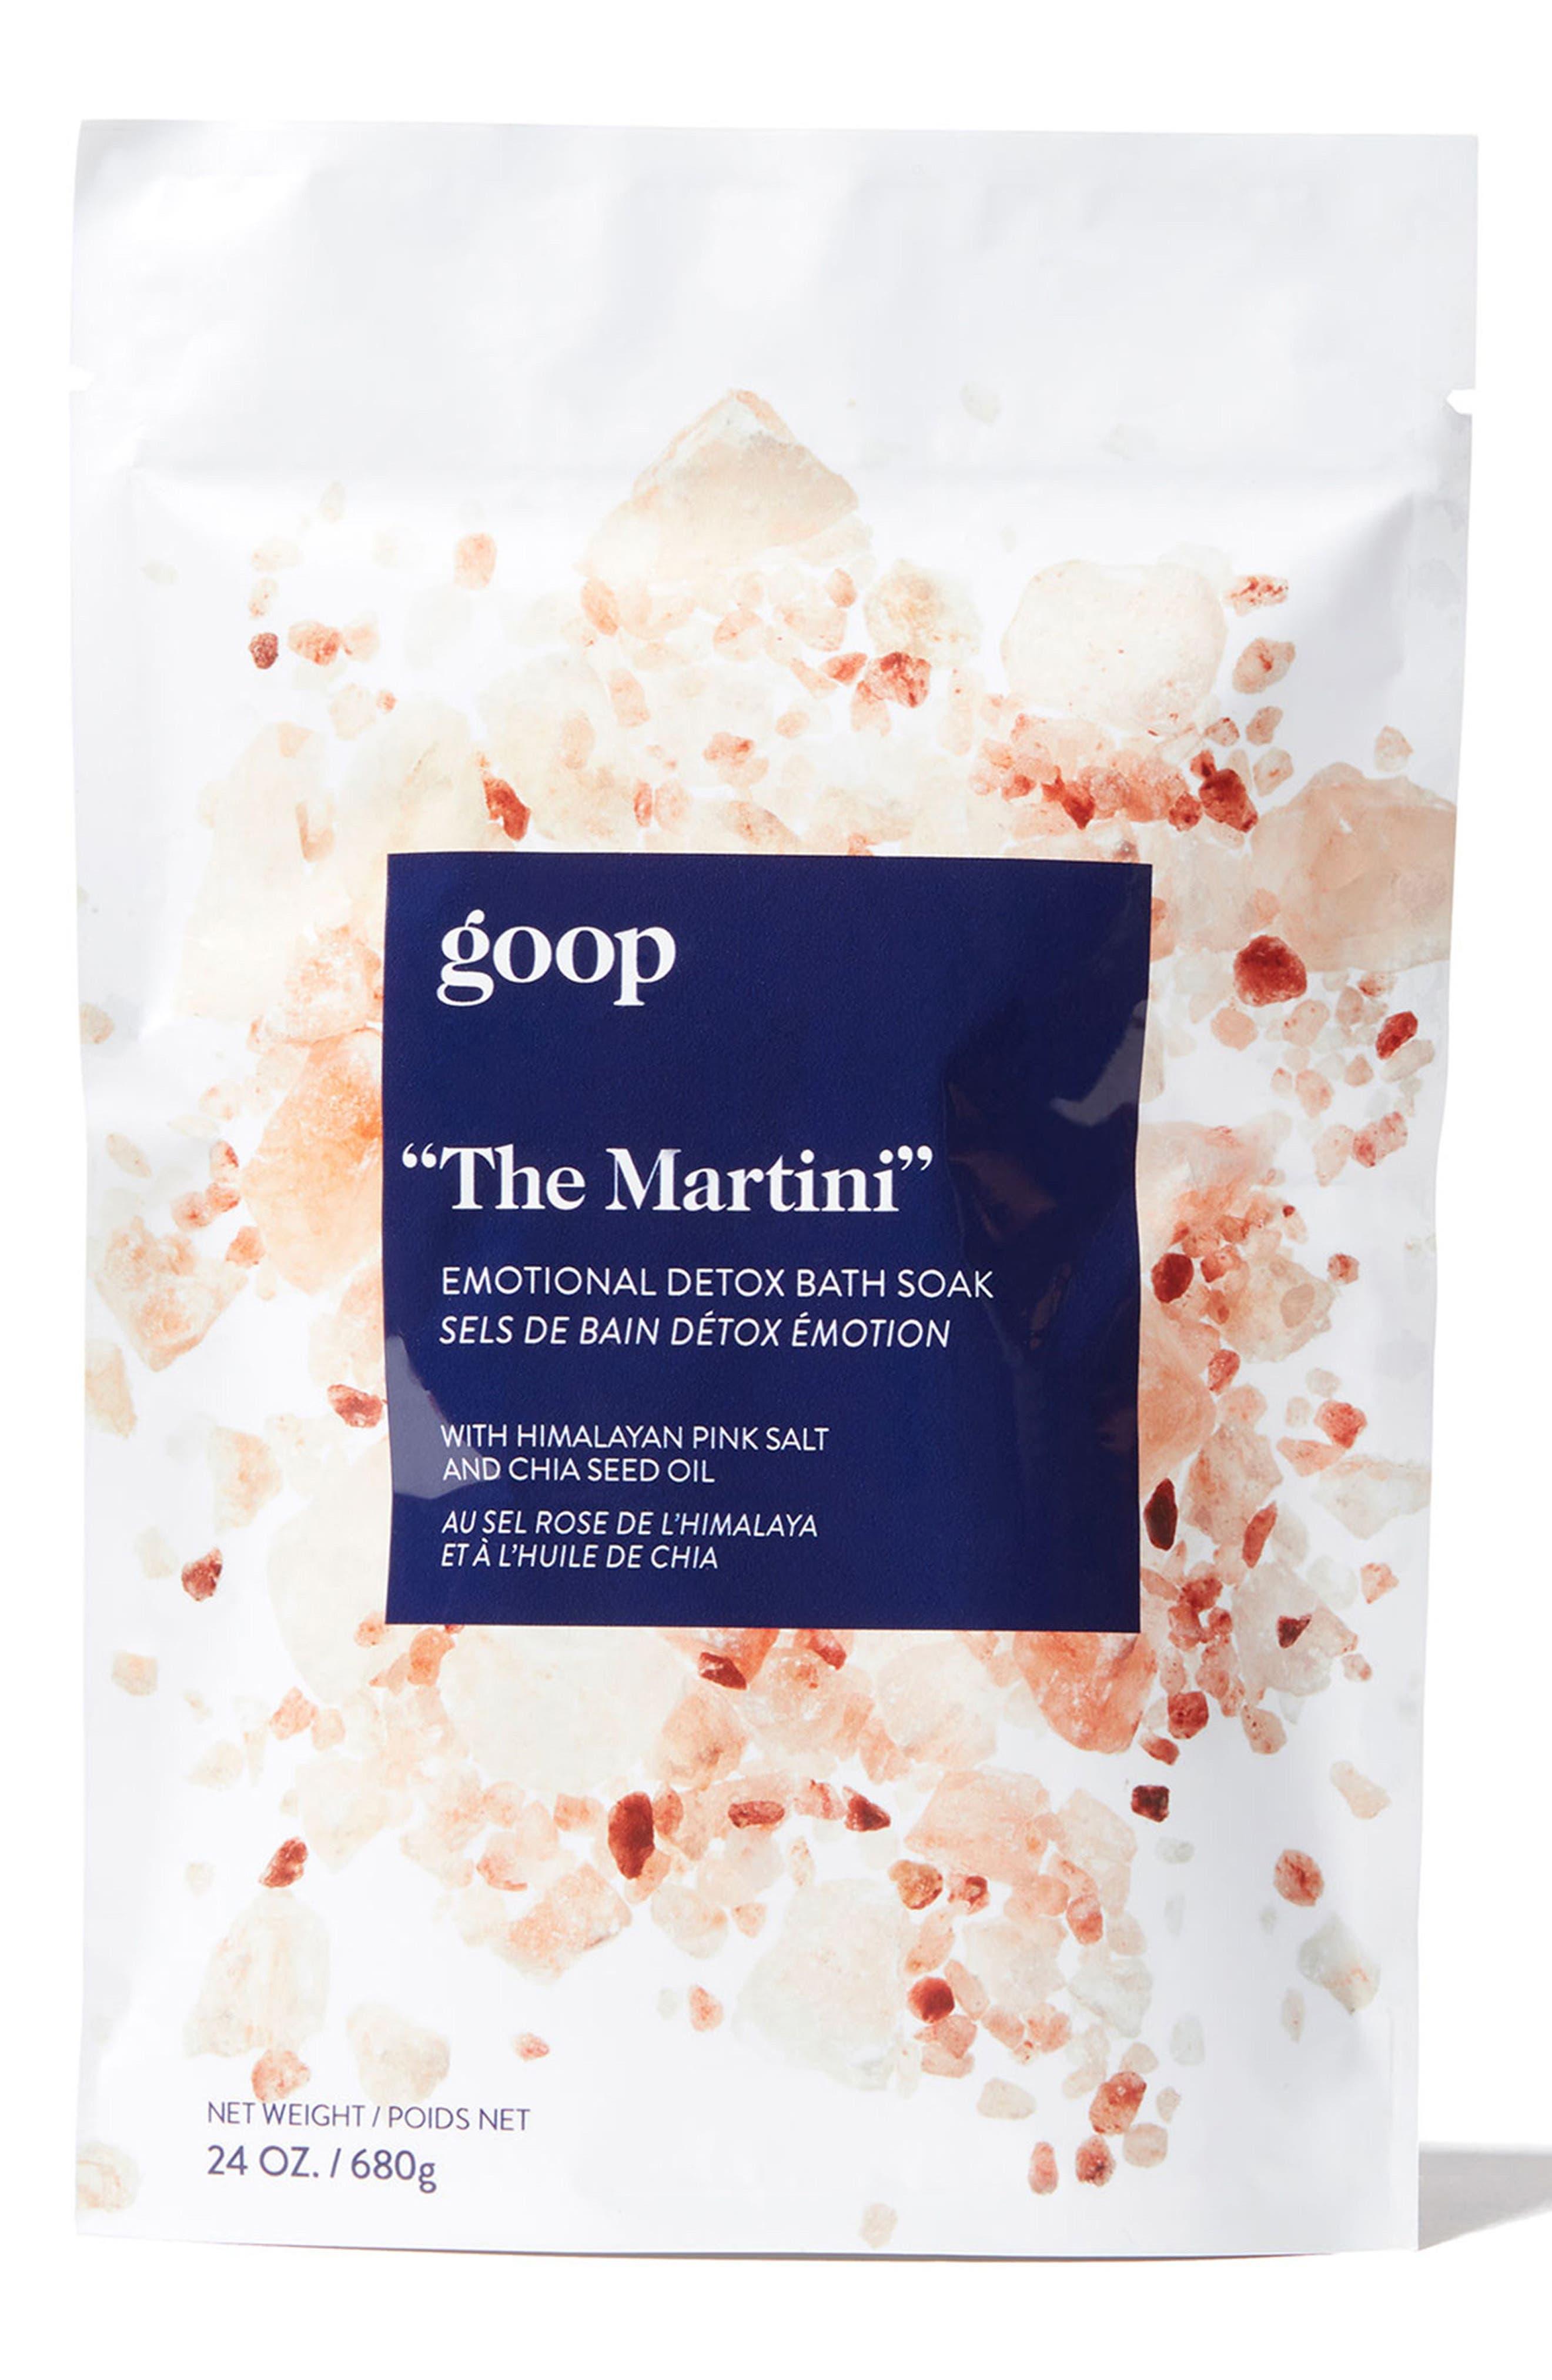 GOOP The Martini Emotional Detox Bath Soak